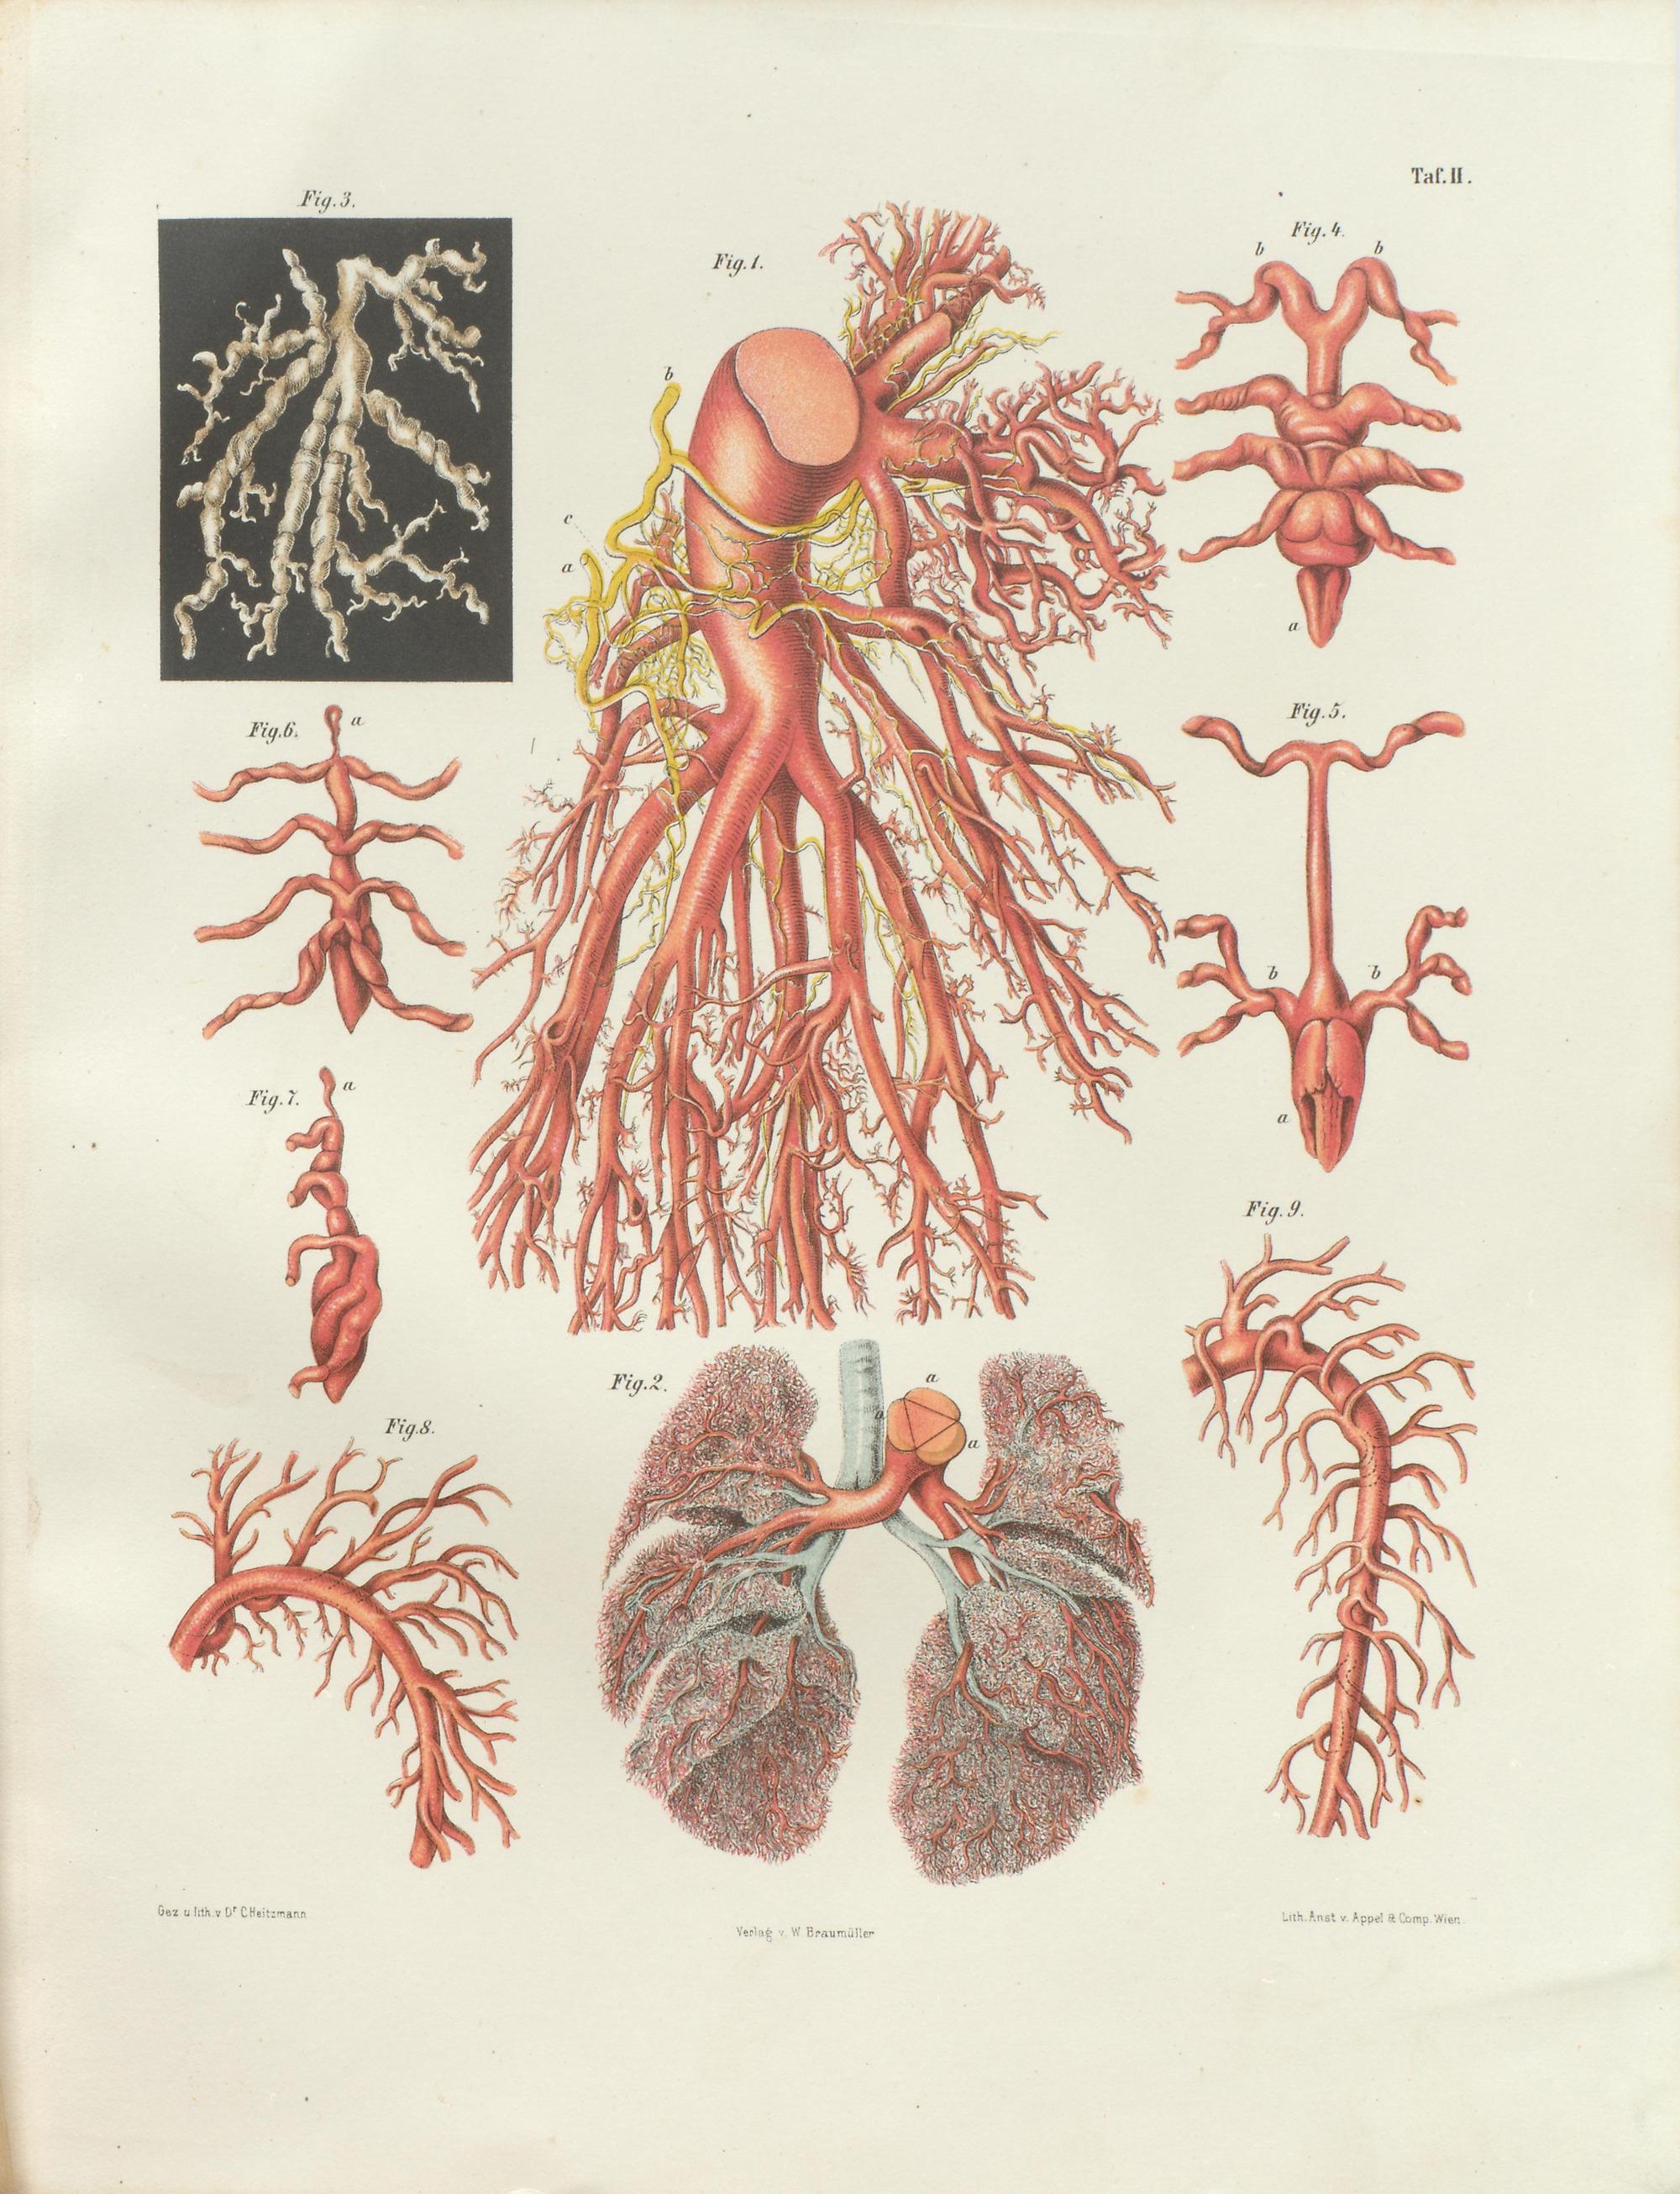 File:Hyrtl Corrosions-Anatomie tafel 002.jpg - Wikimedia Commons